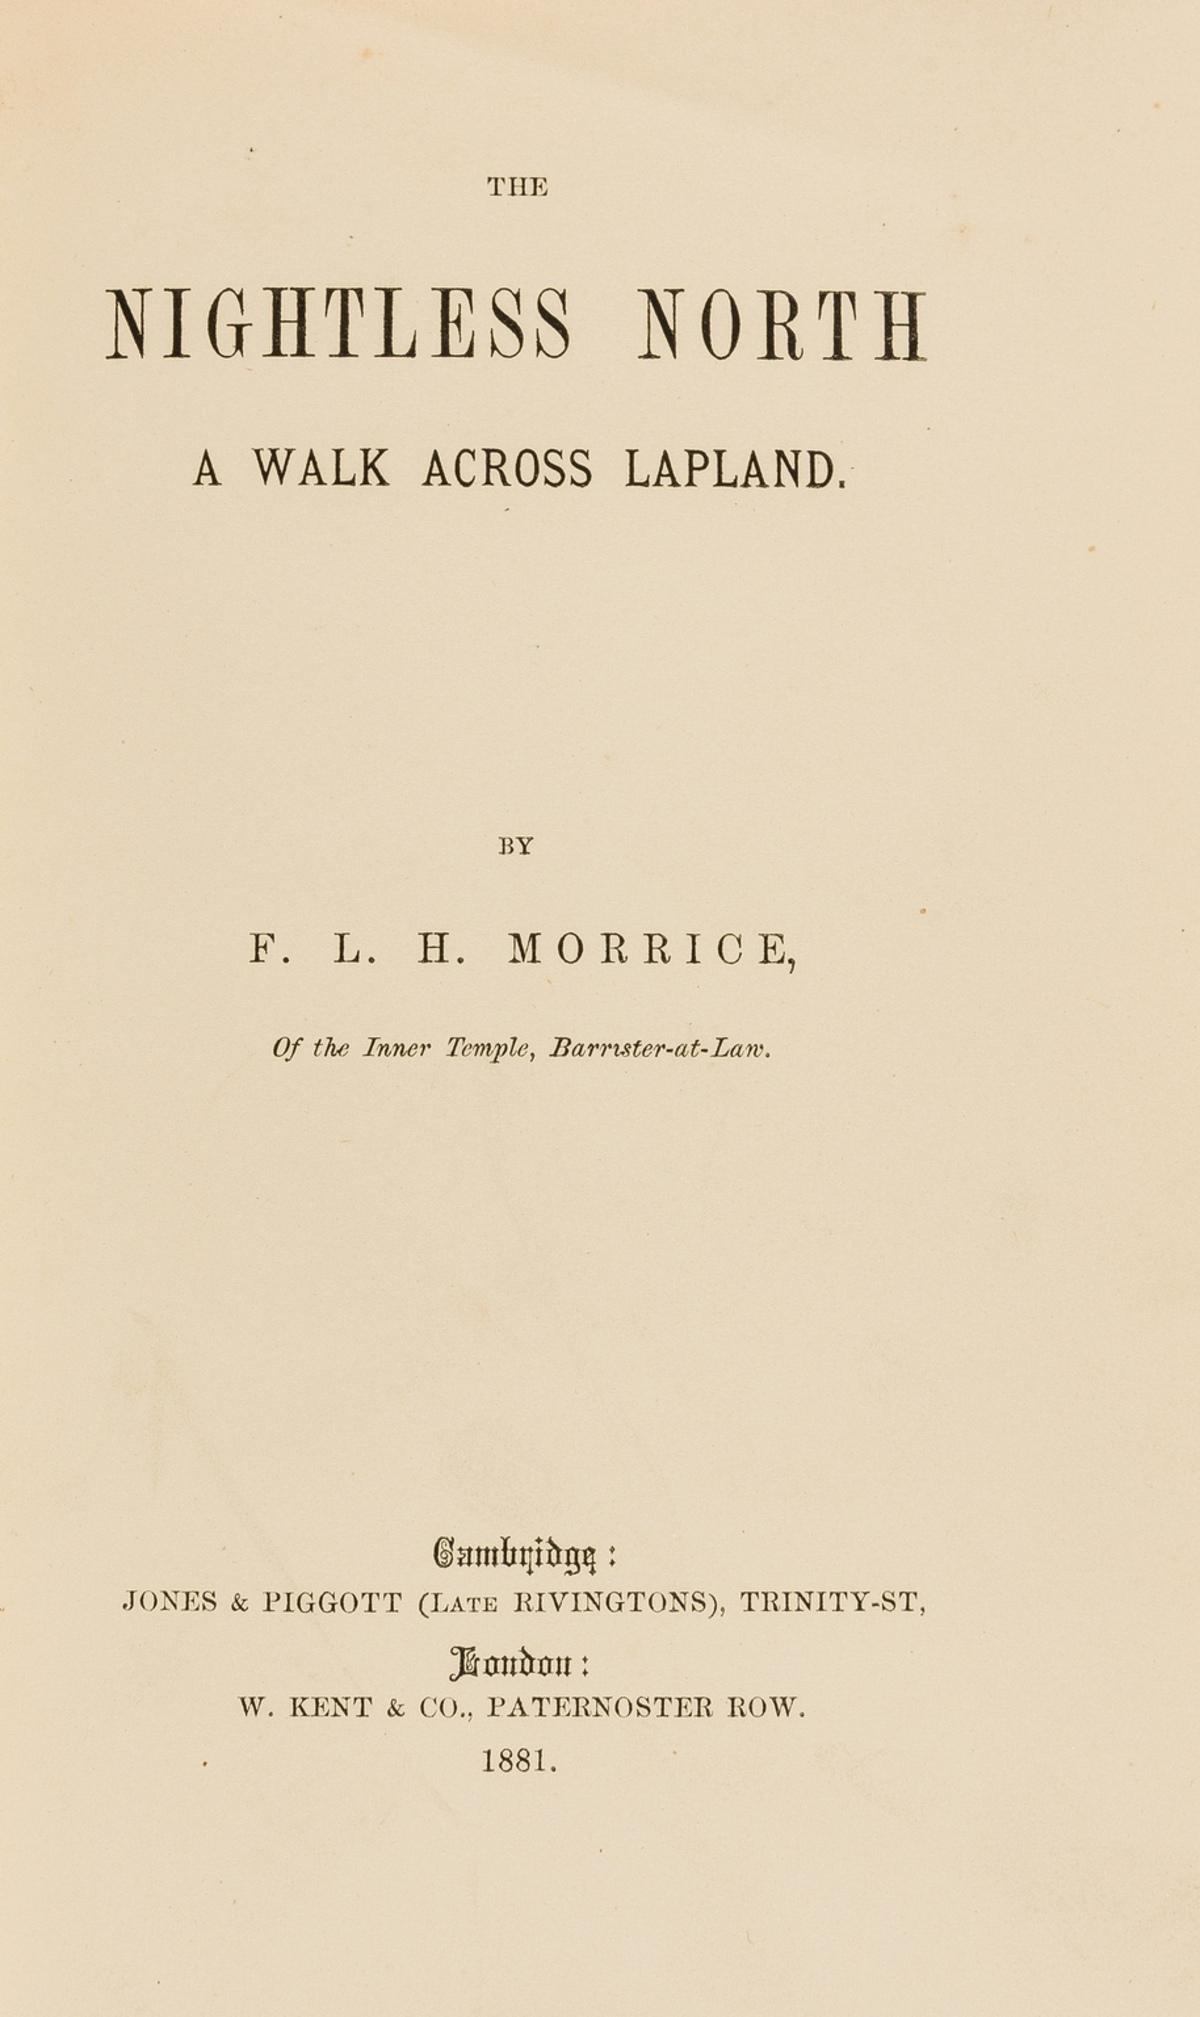 Arctic.- Morrice (F. L. H.) The Nightless North: a Walk across Lapland, Cambridge and London, 1881.